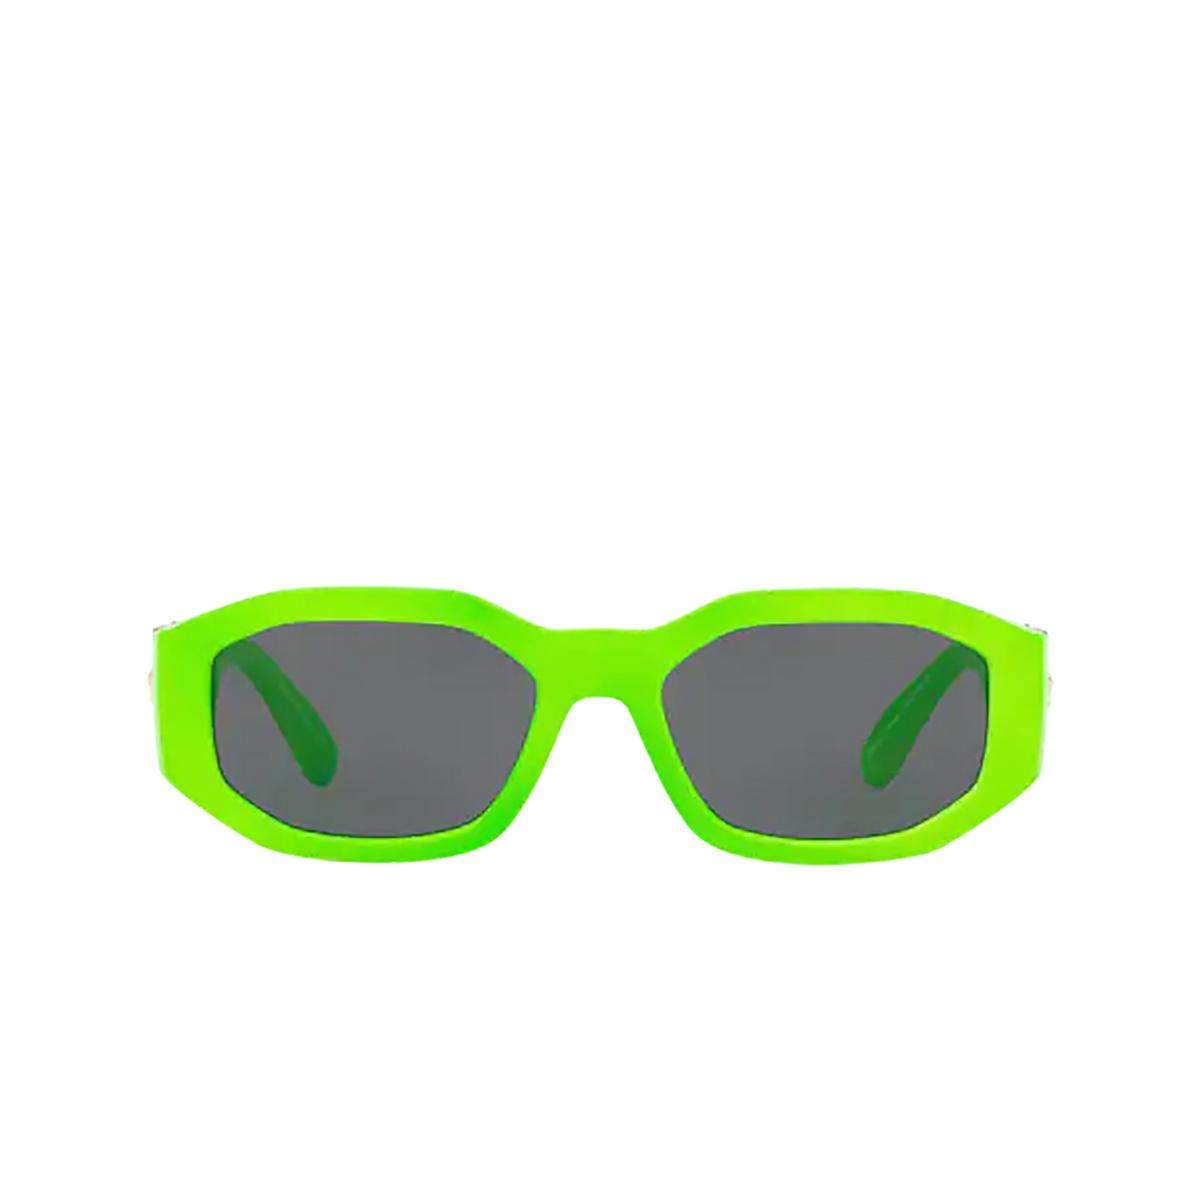 Versace® Irregular Sunglasses: VE4361 color Green Fluo 531987.